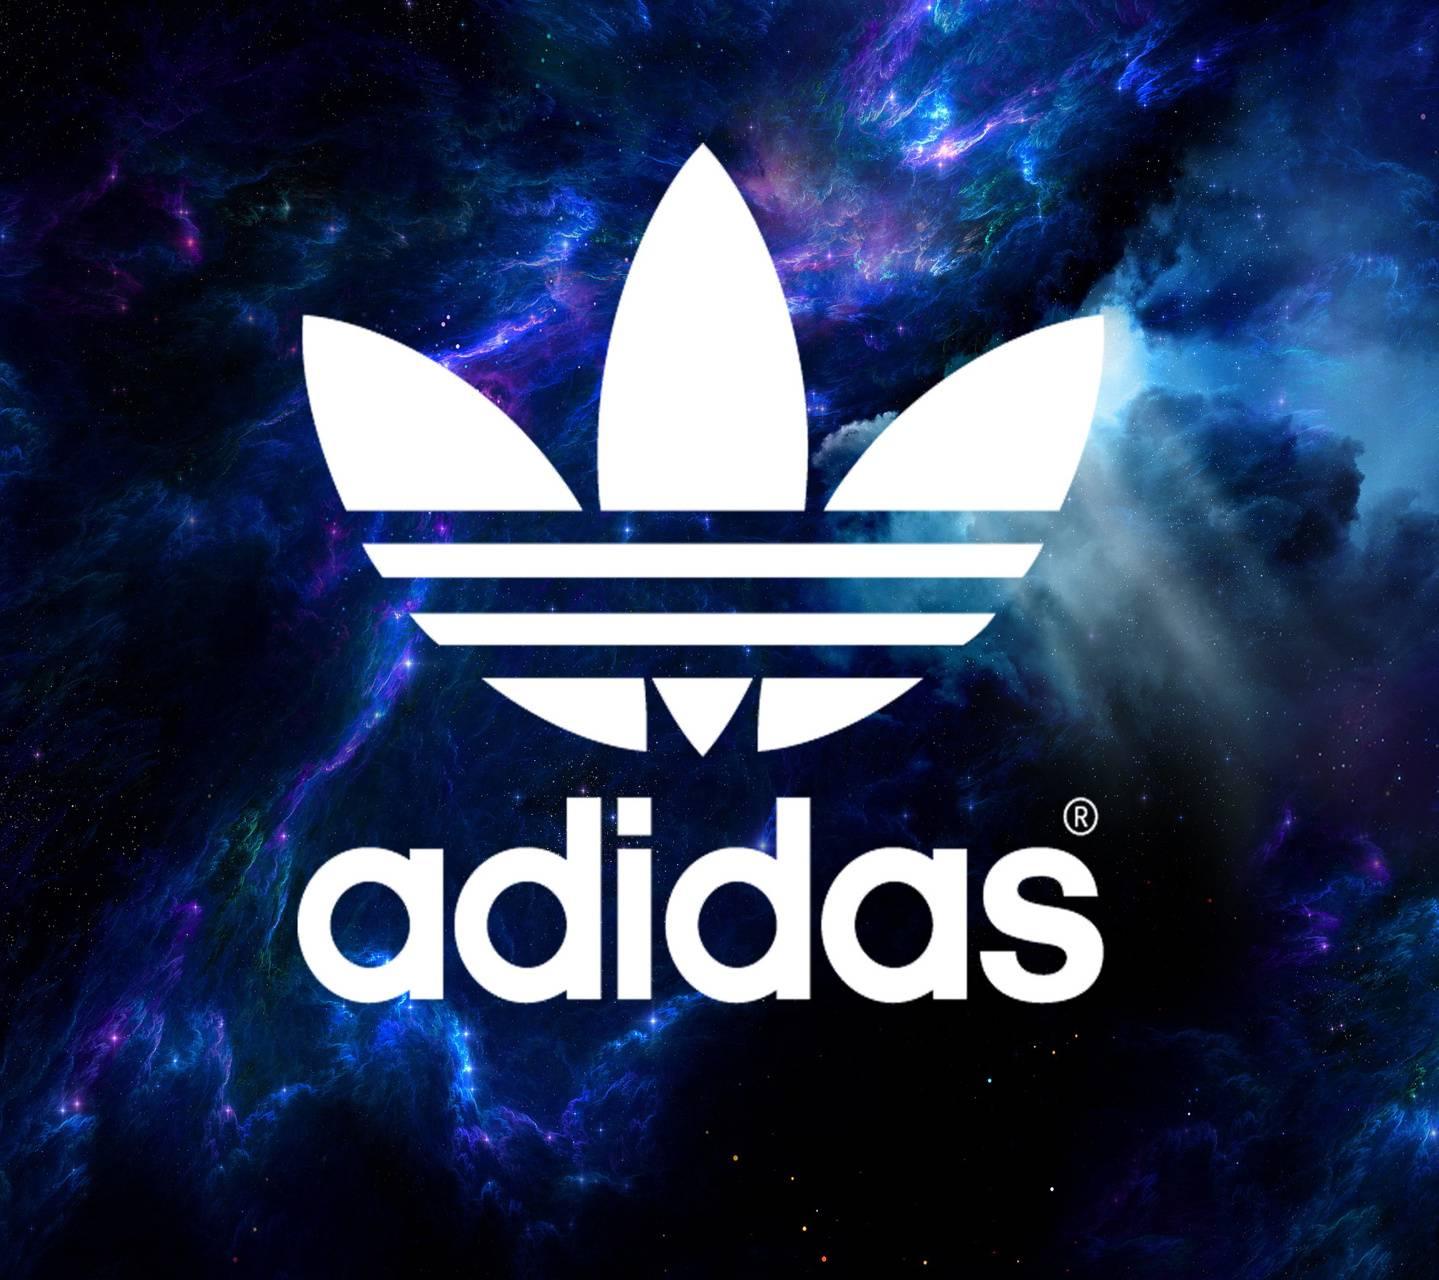 Adidas Deep Space